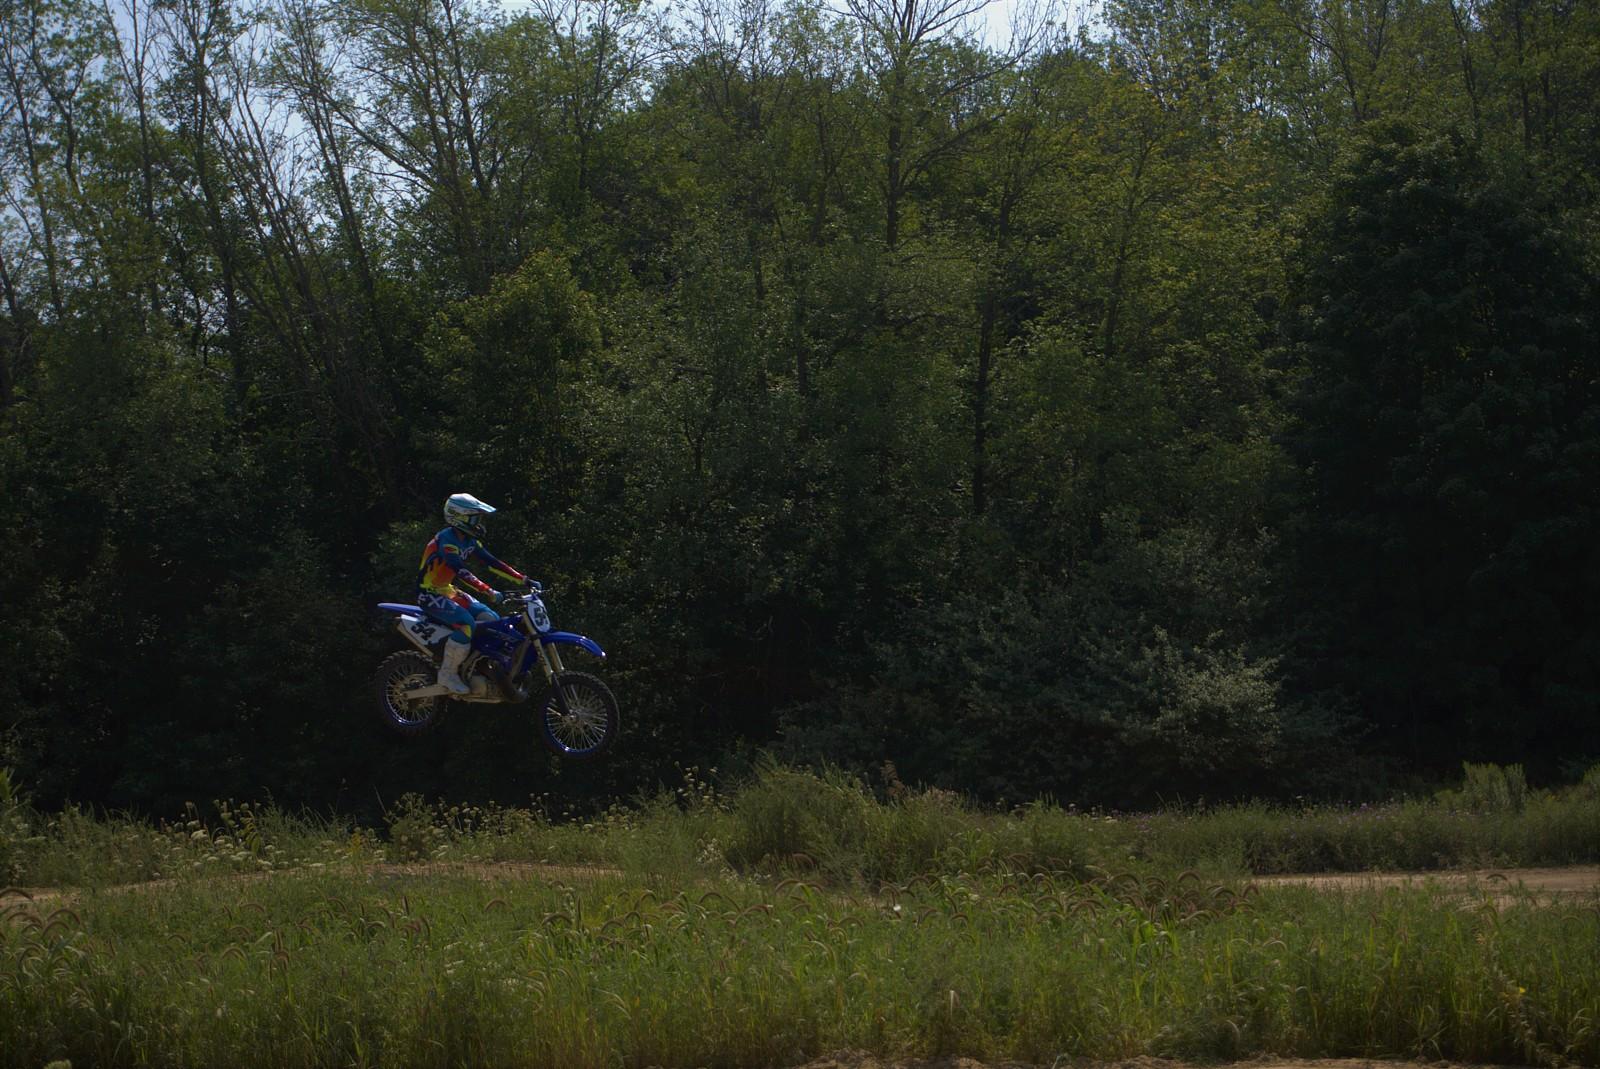 Photo 6 - DawsonBMX54 - Motocross Pictures - Vital MX